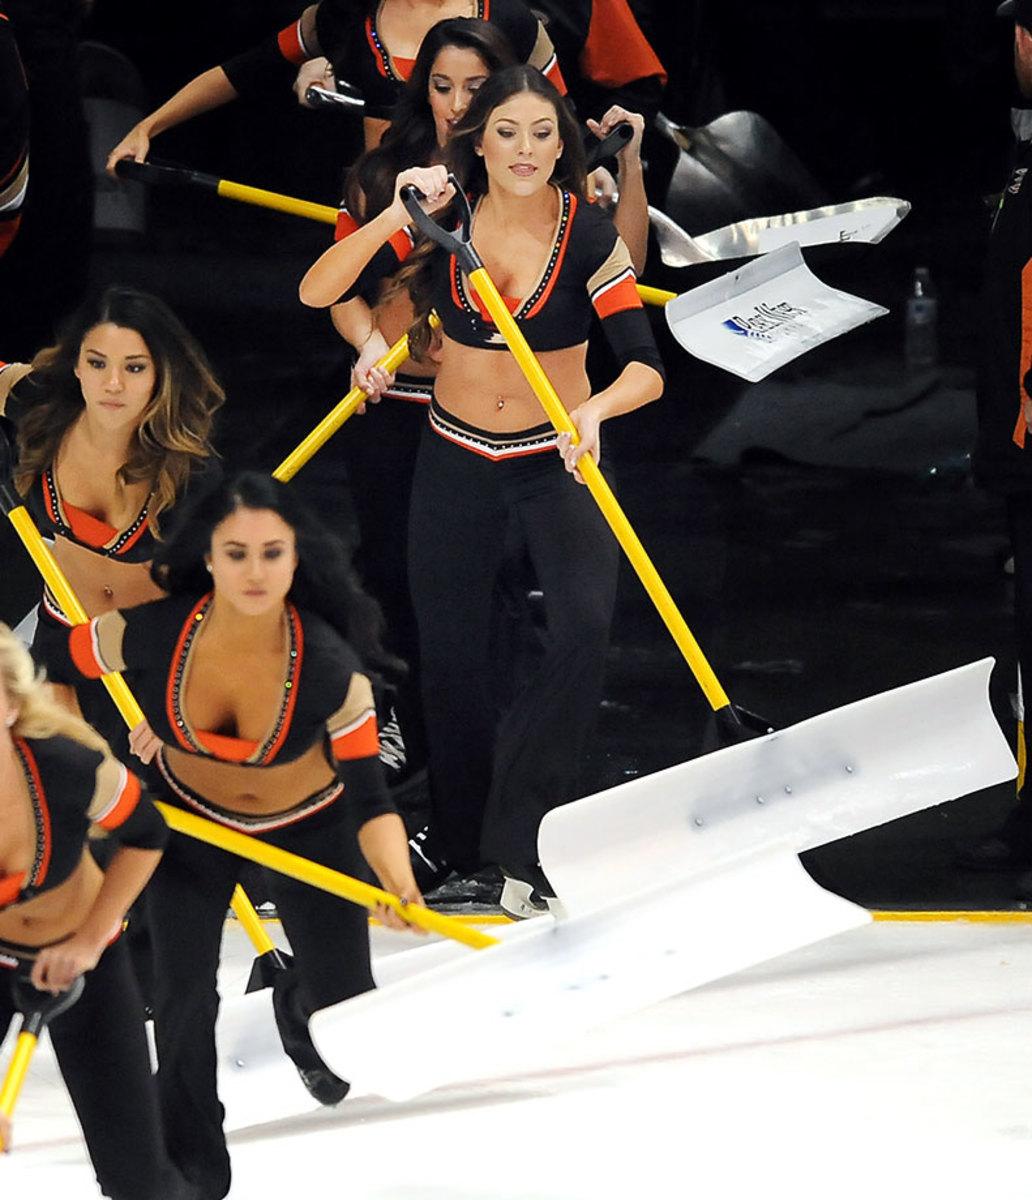 Anaheim-Ducks-Power-Players-Ice-Girls-506160117025_Kings_at_Ducks.jpg